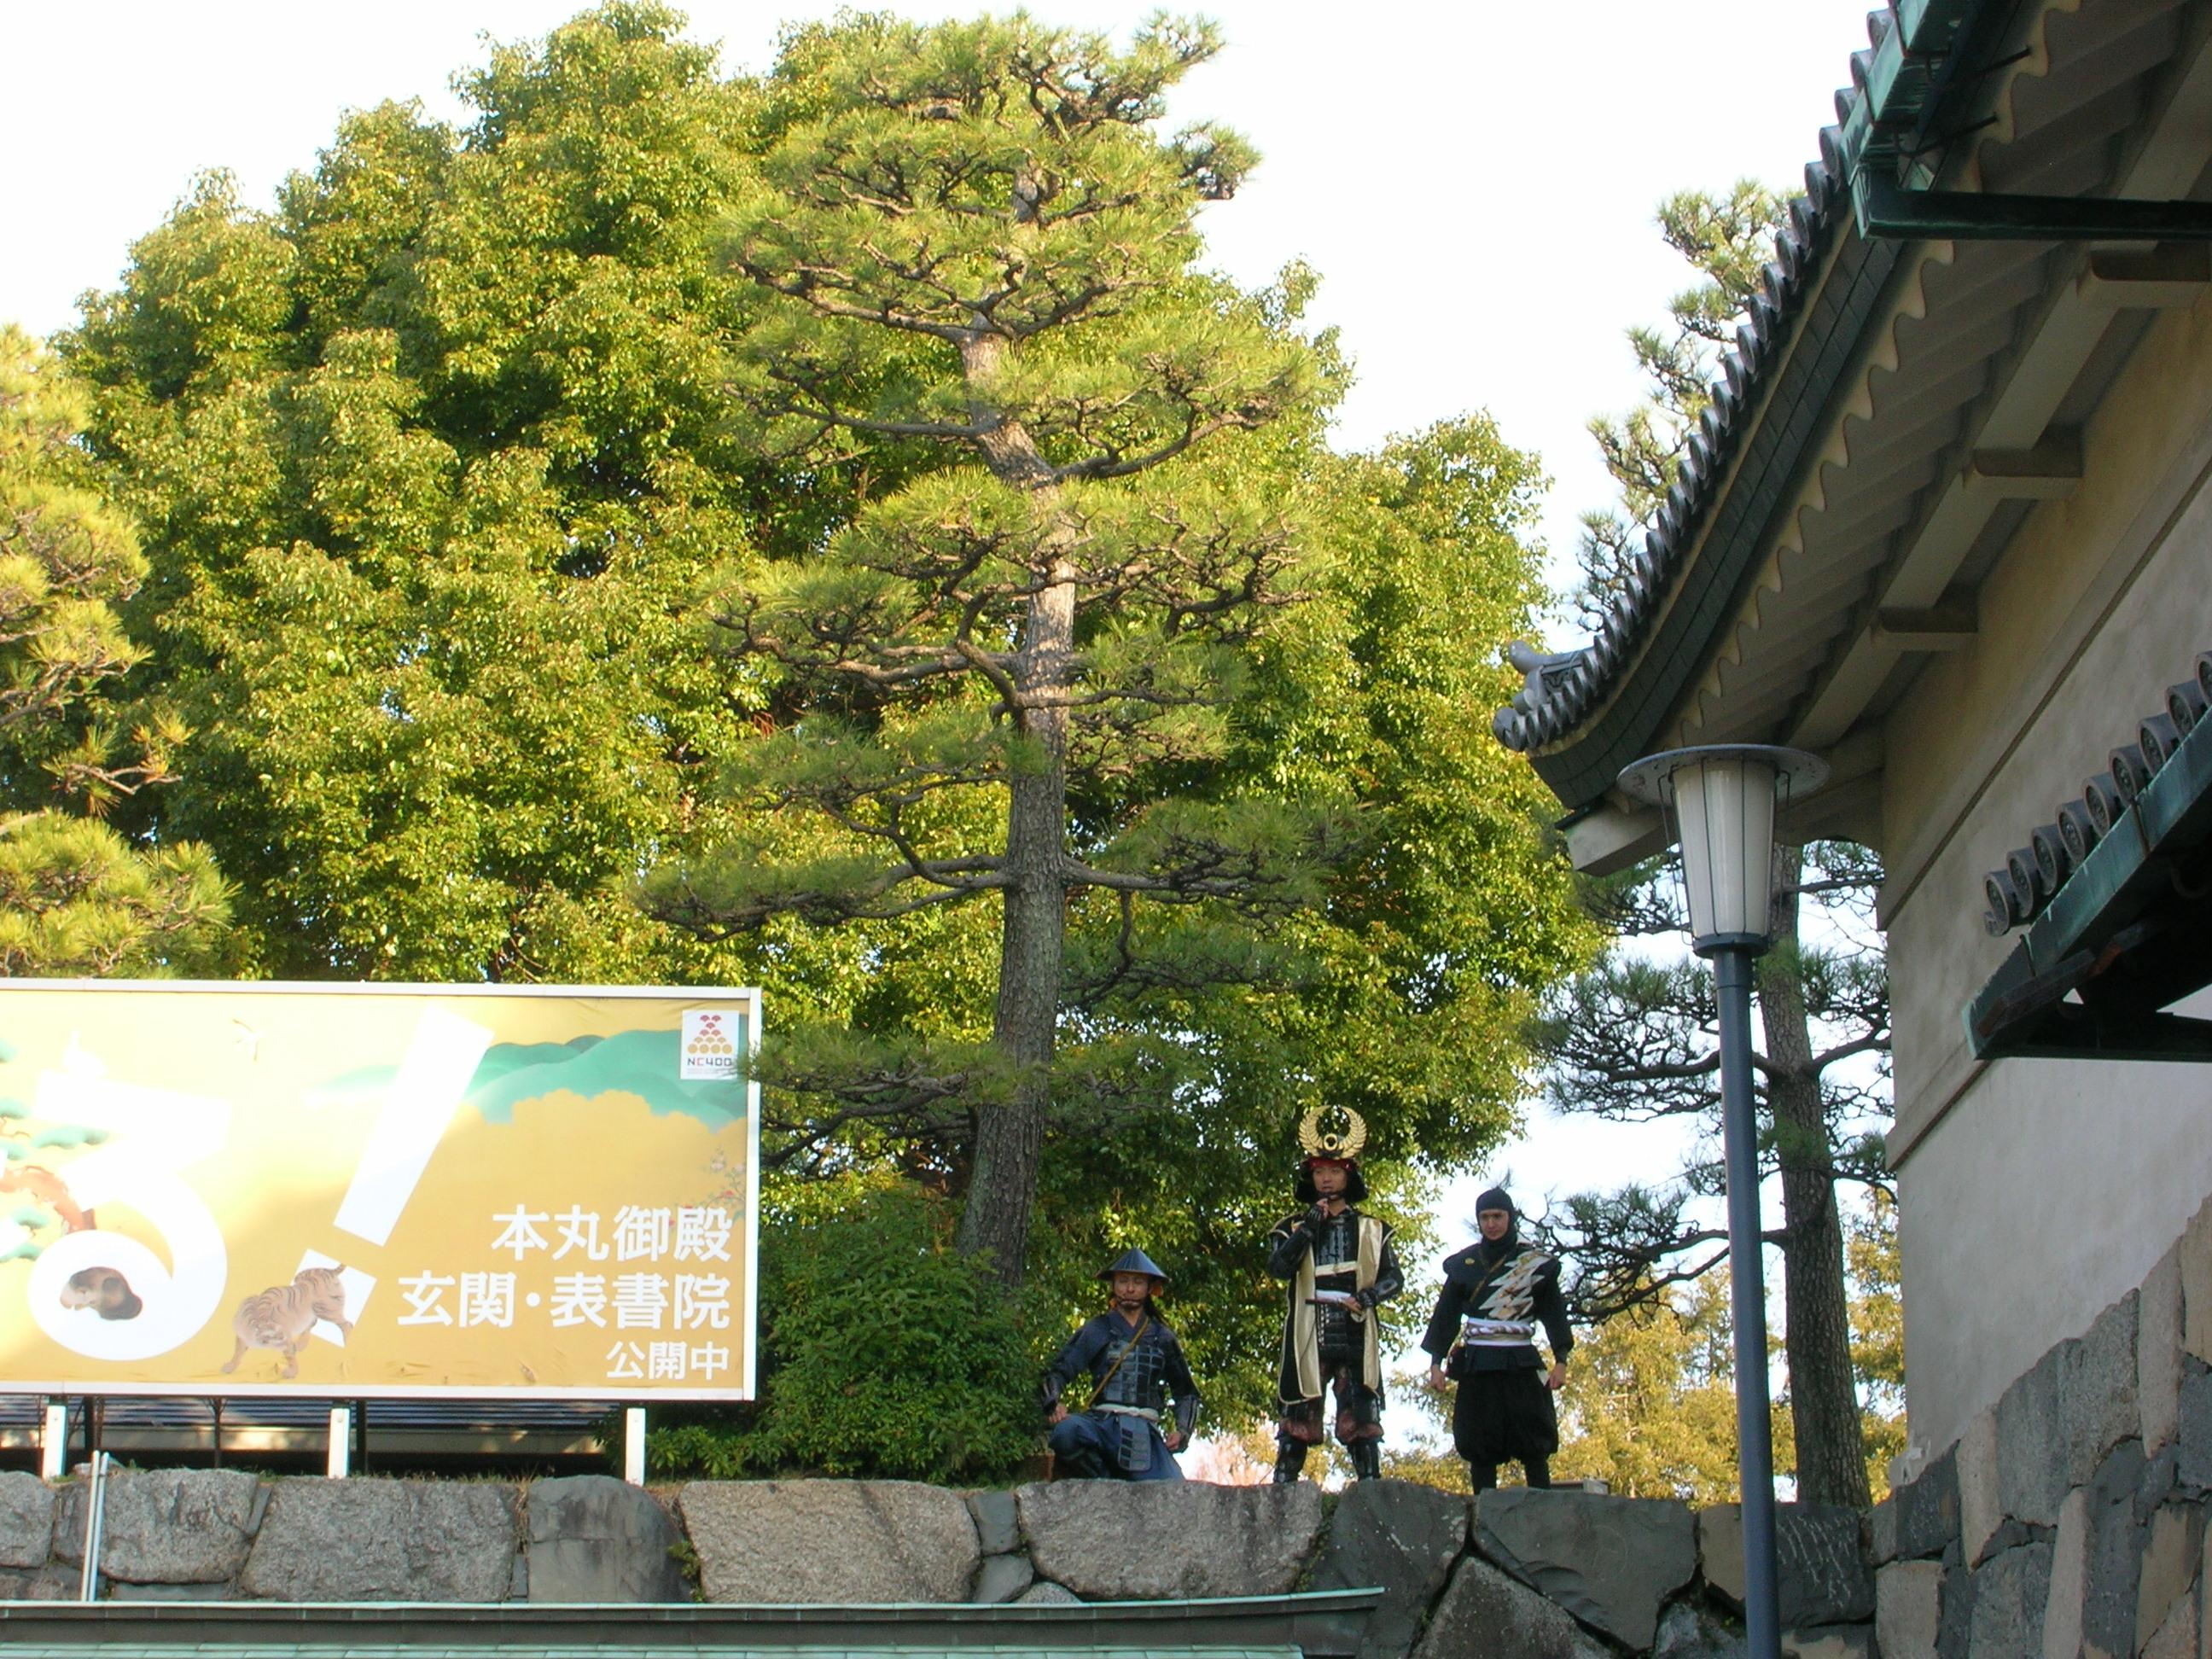 filenagoya castle 2016 opening ceremony ieyasu toma hanzojpg - Open Castle 2016